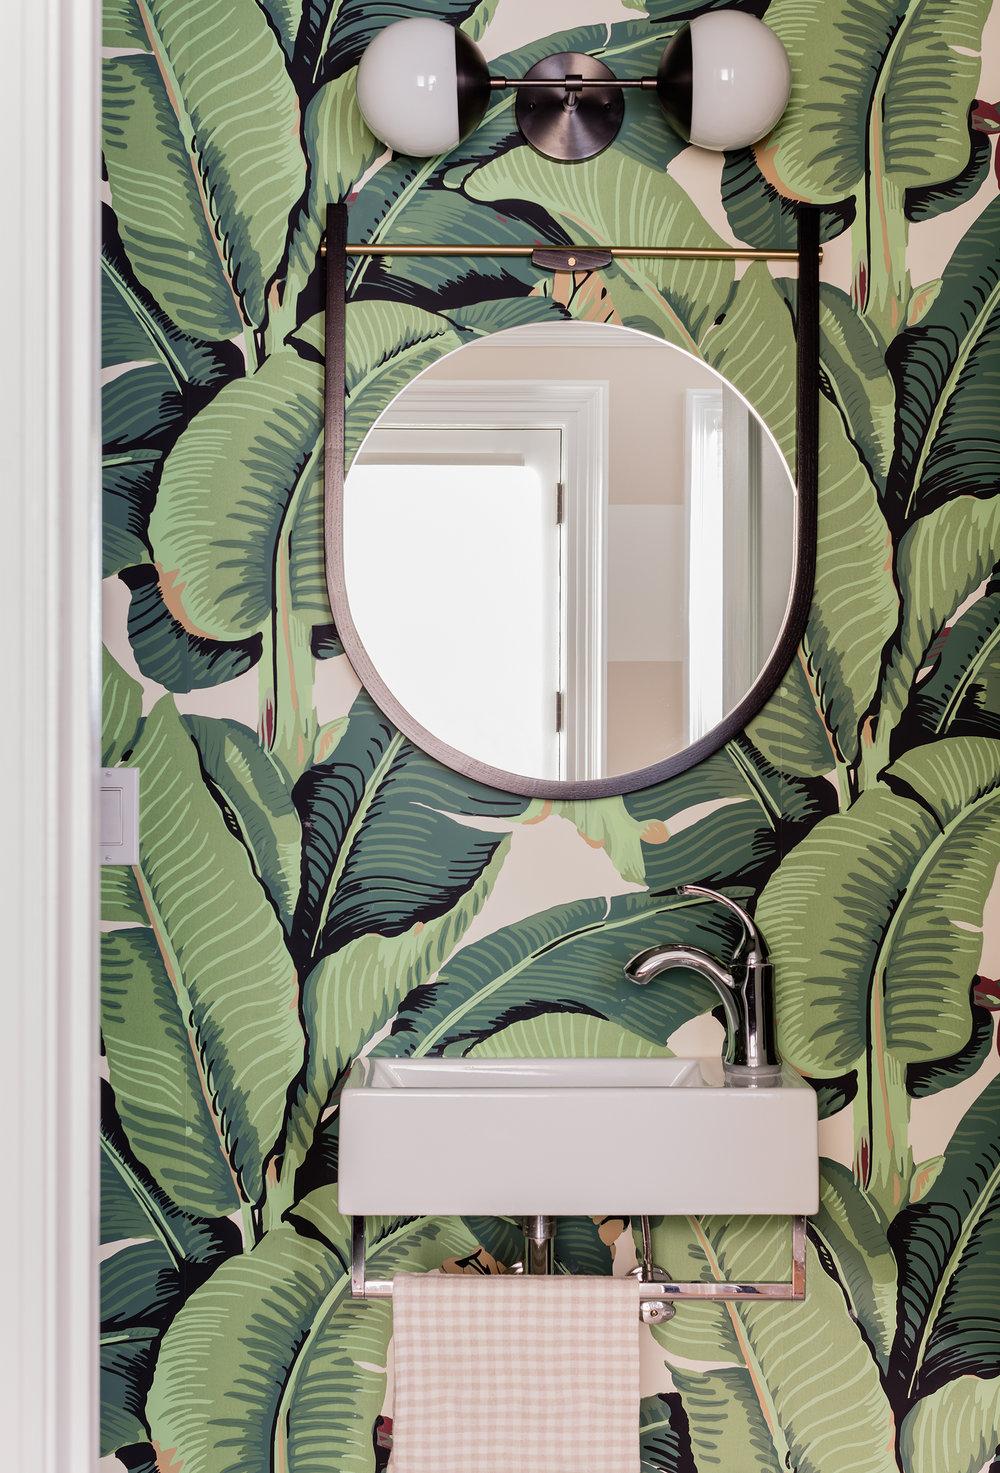 South-End-Project-4-E-Hudson-Interior-Design.jpg